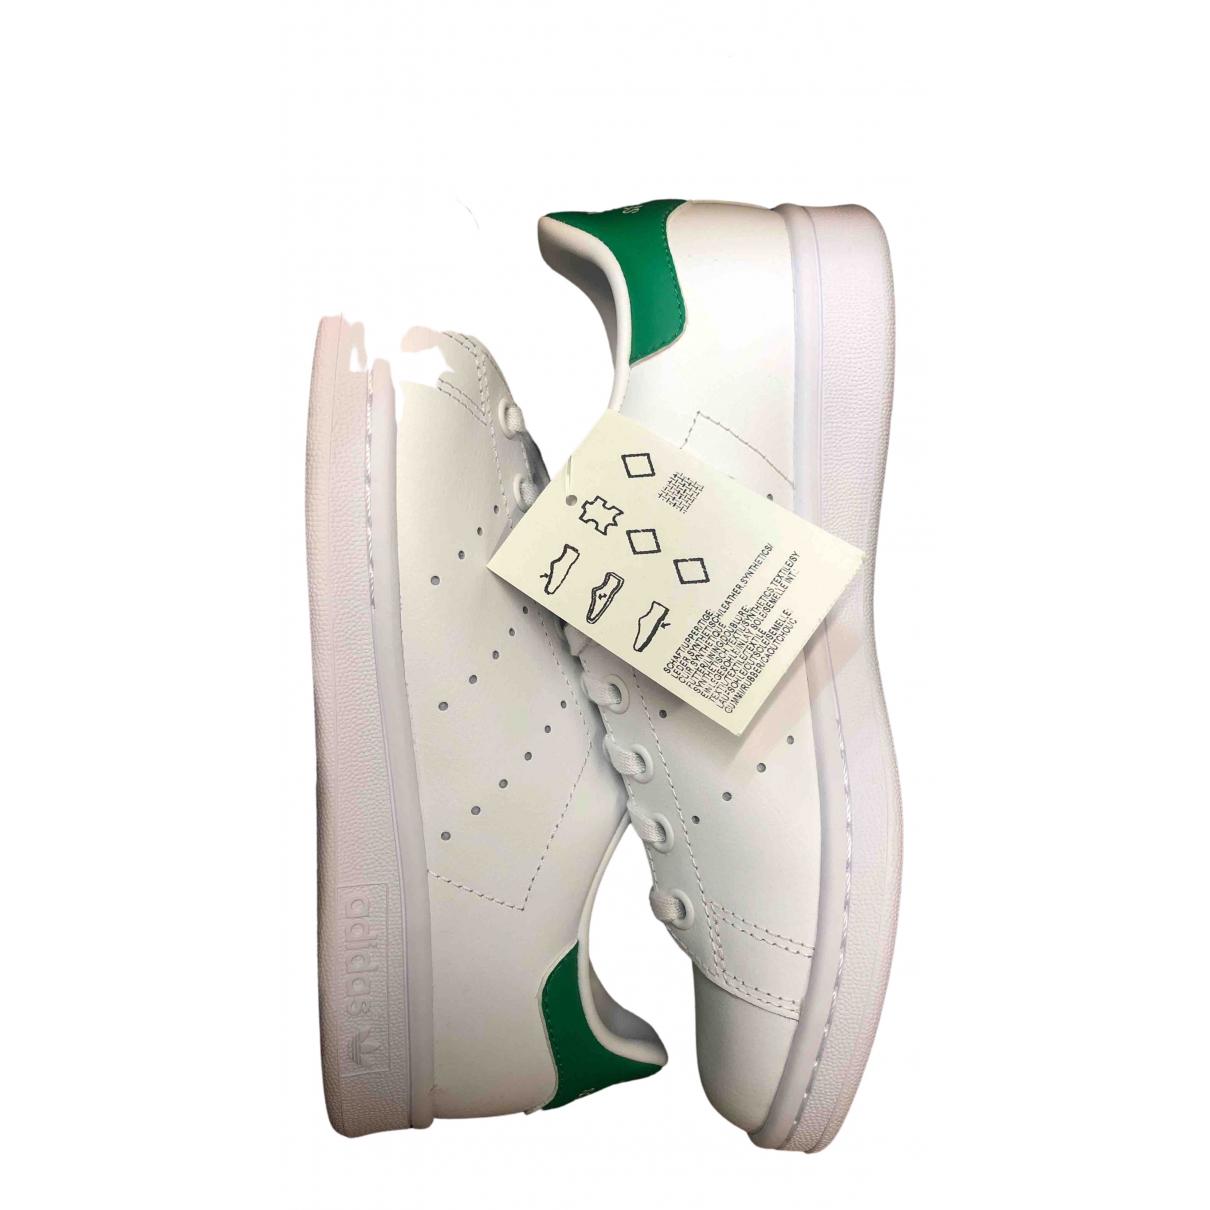 Adidas Stan Smith Sneakers in  Weiss Kautschuk